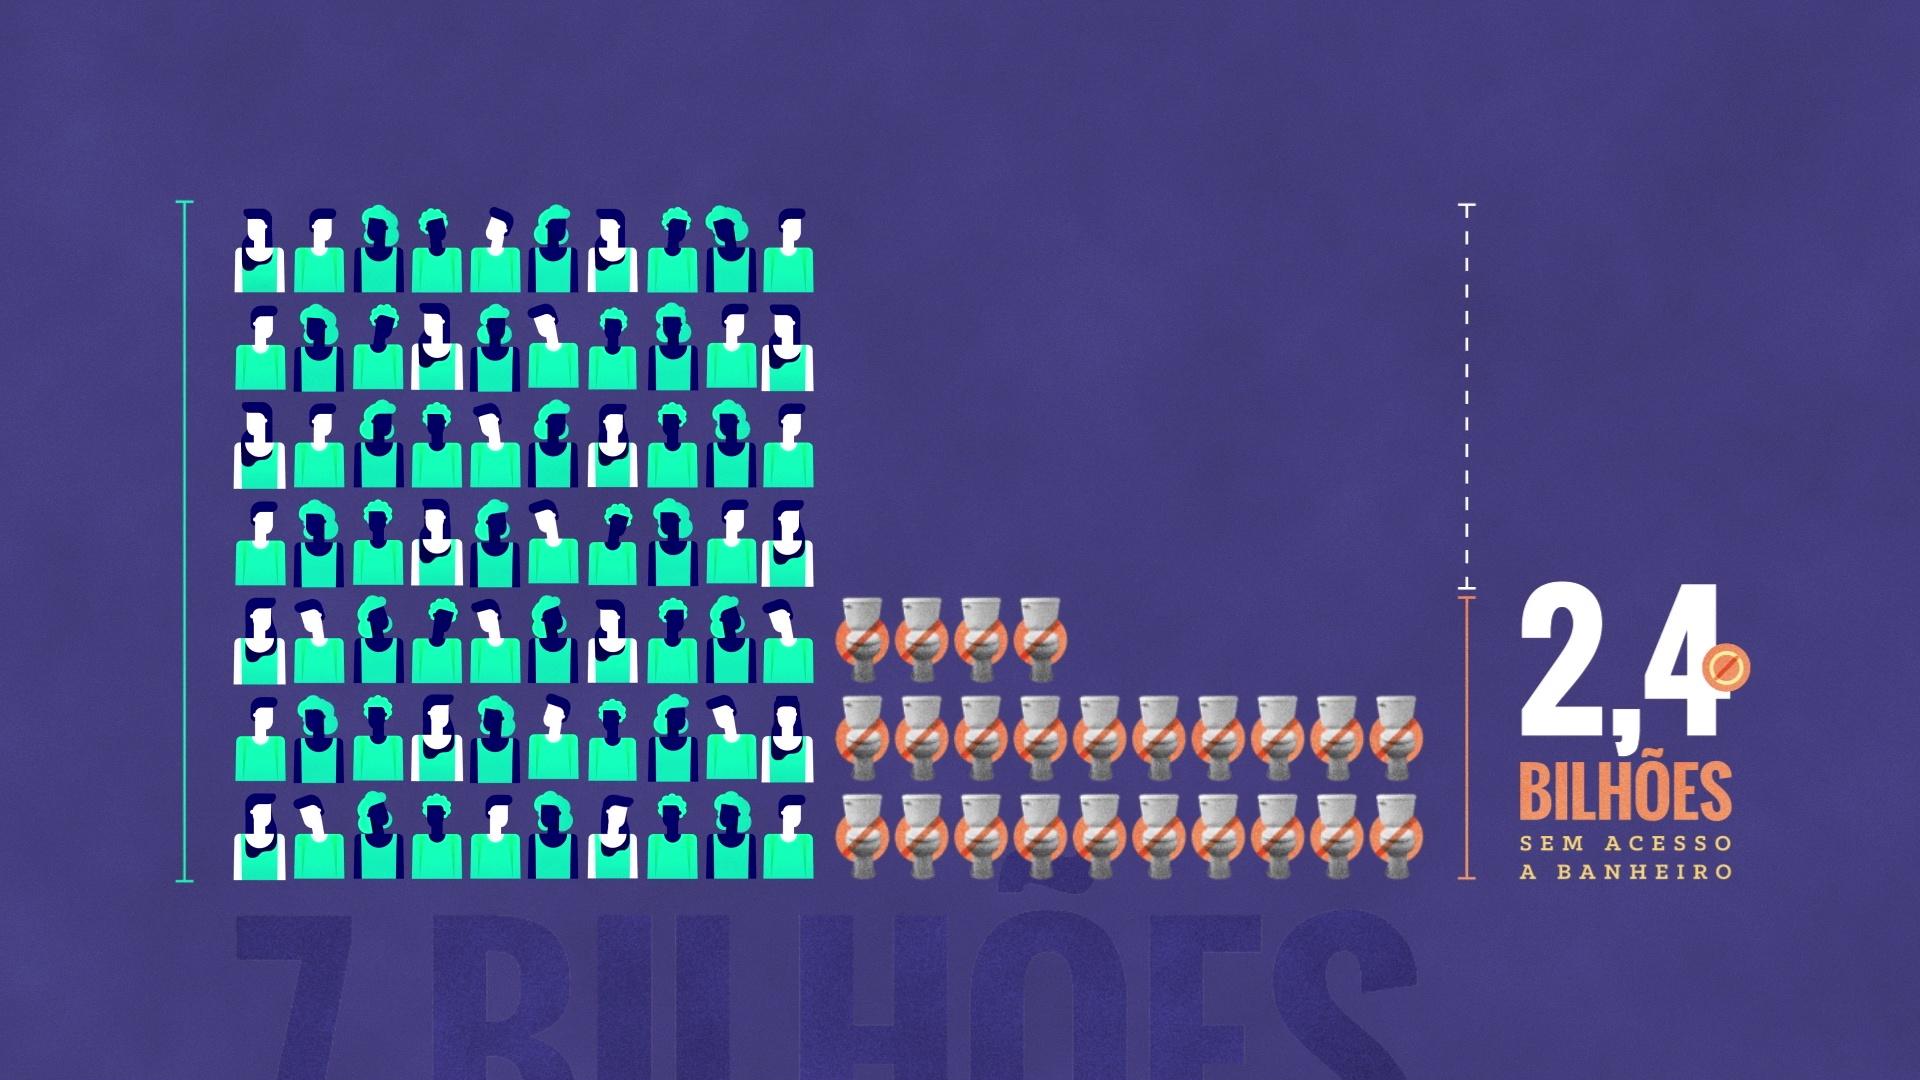 6th image of Juntos Pela Água project